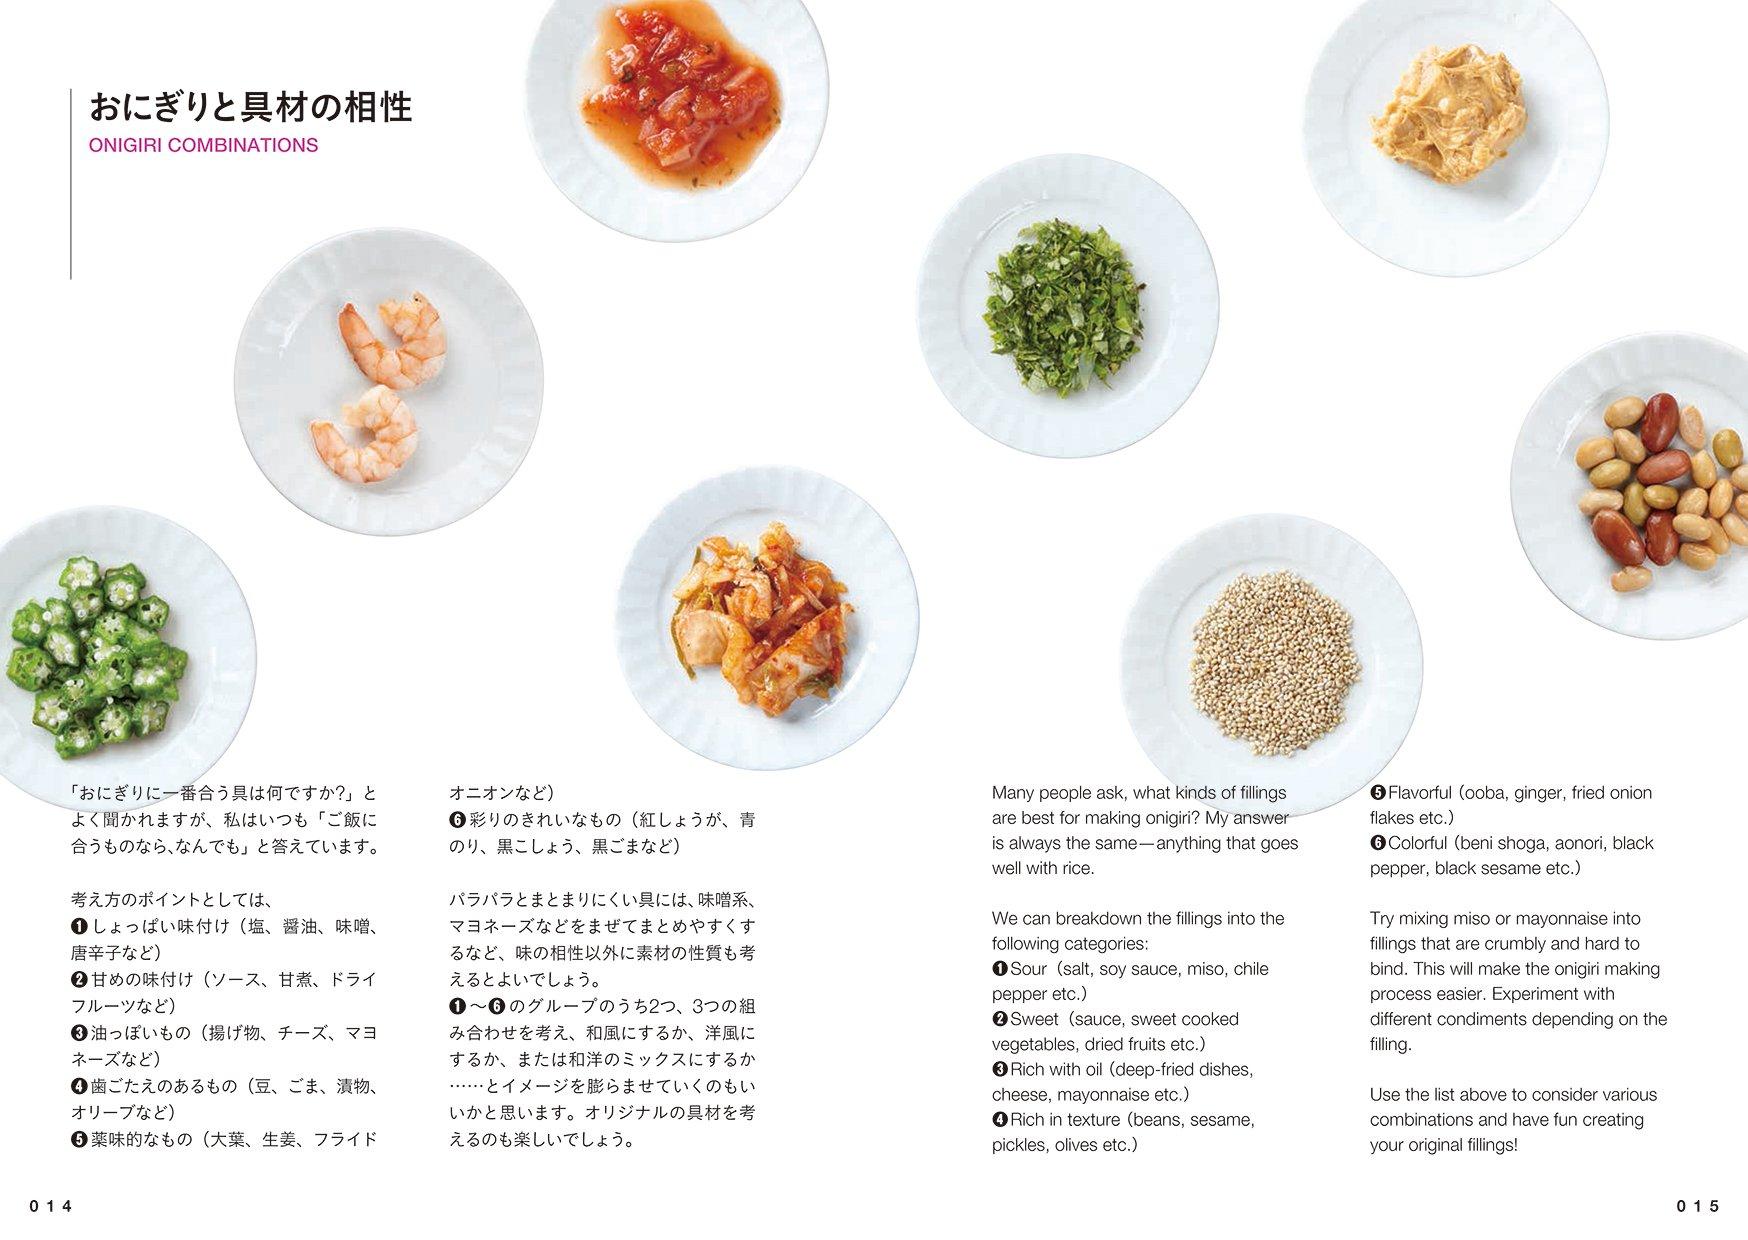 Everyday Onigiri 101: Healthy, Easy Japanese Riceball